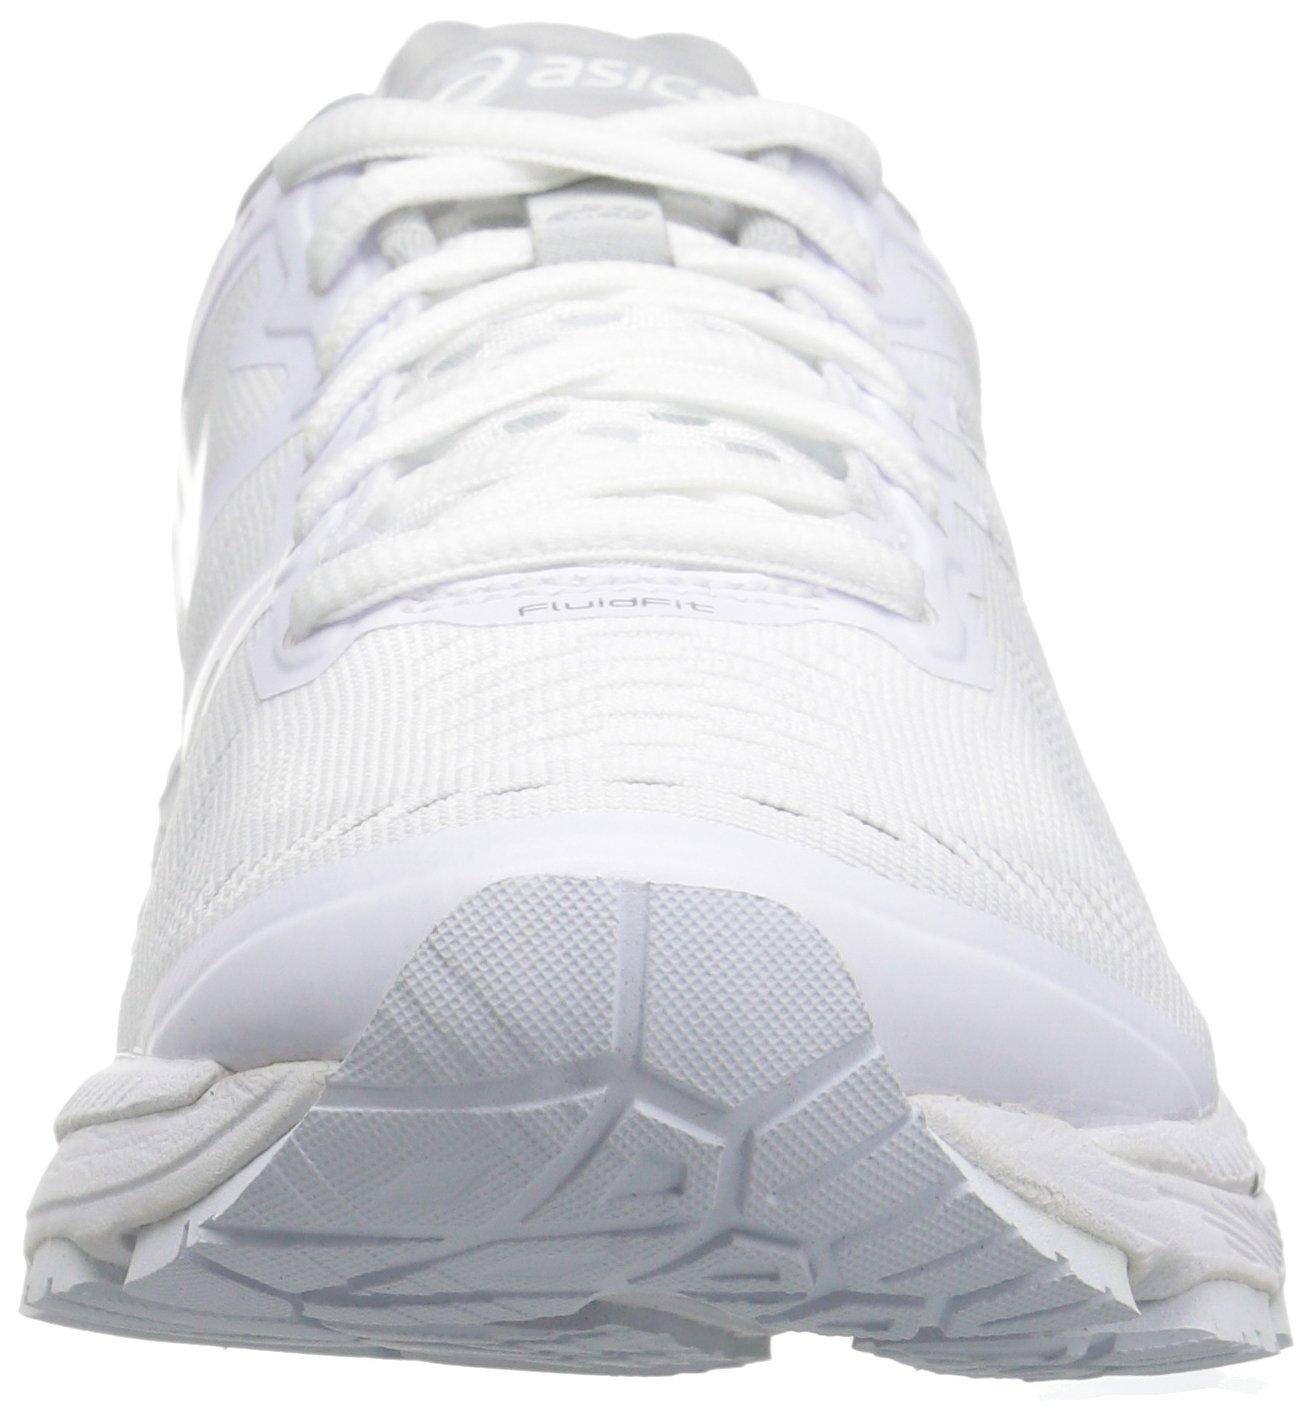 Zapatillas de running 3938 19907 Gel ASICS Zapatillas Kayano de 23 ASICS para/ mujer 561ec1d - vendingmatic.info